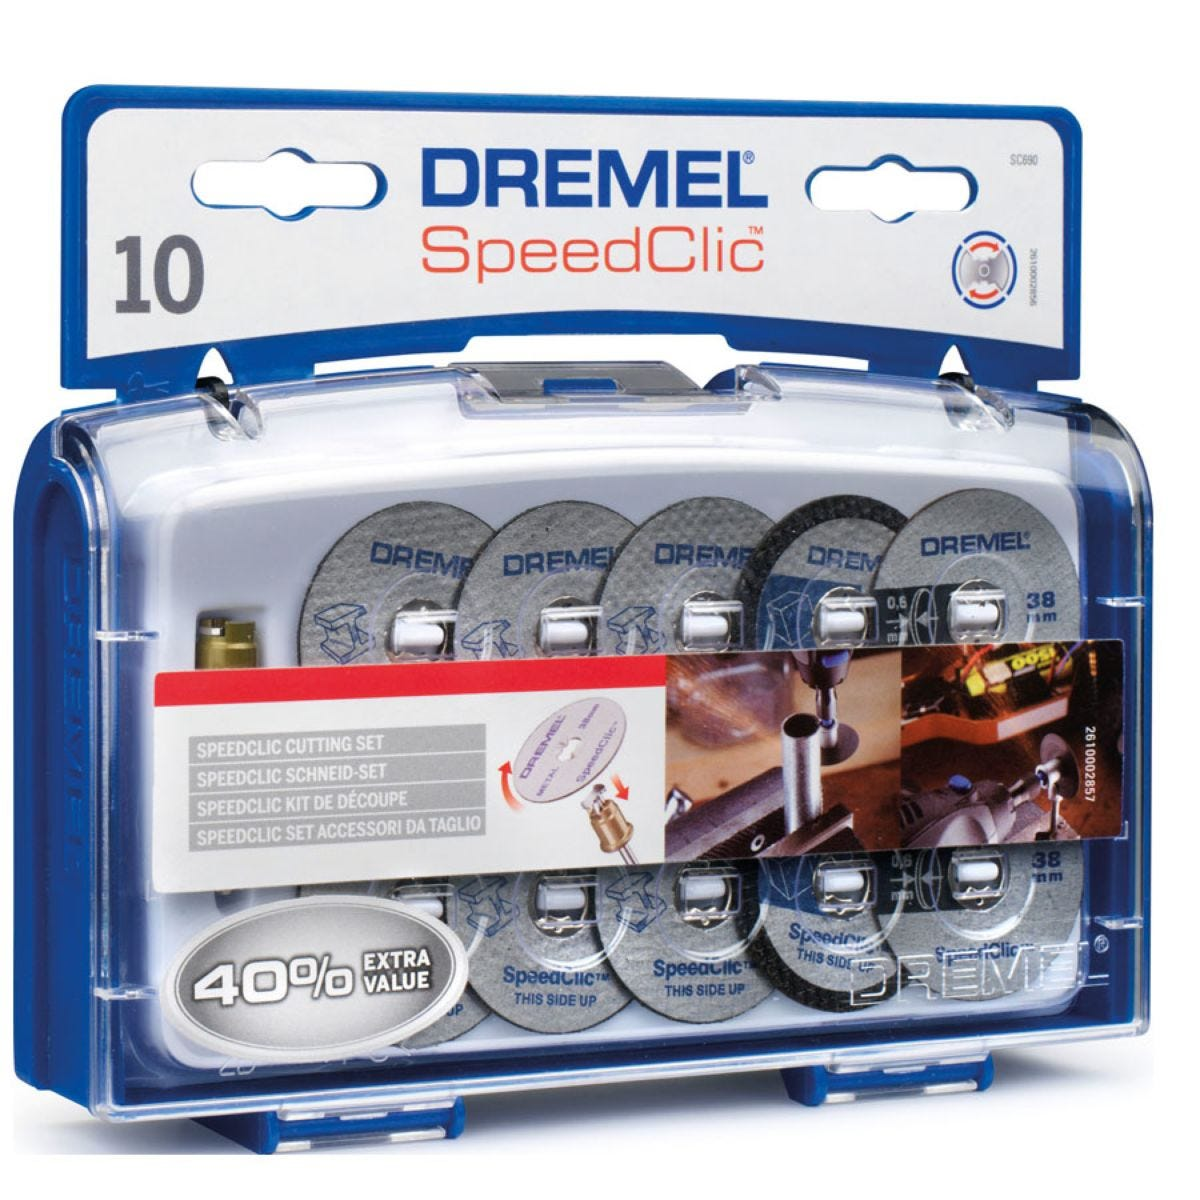 Dremel EZ SpeedClic Mandrel and Cutting Accessories – Pack of 10